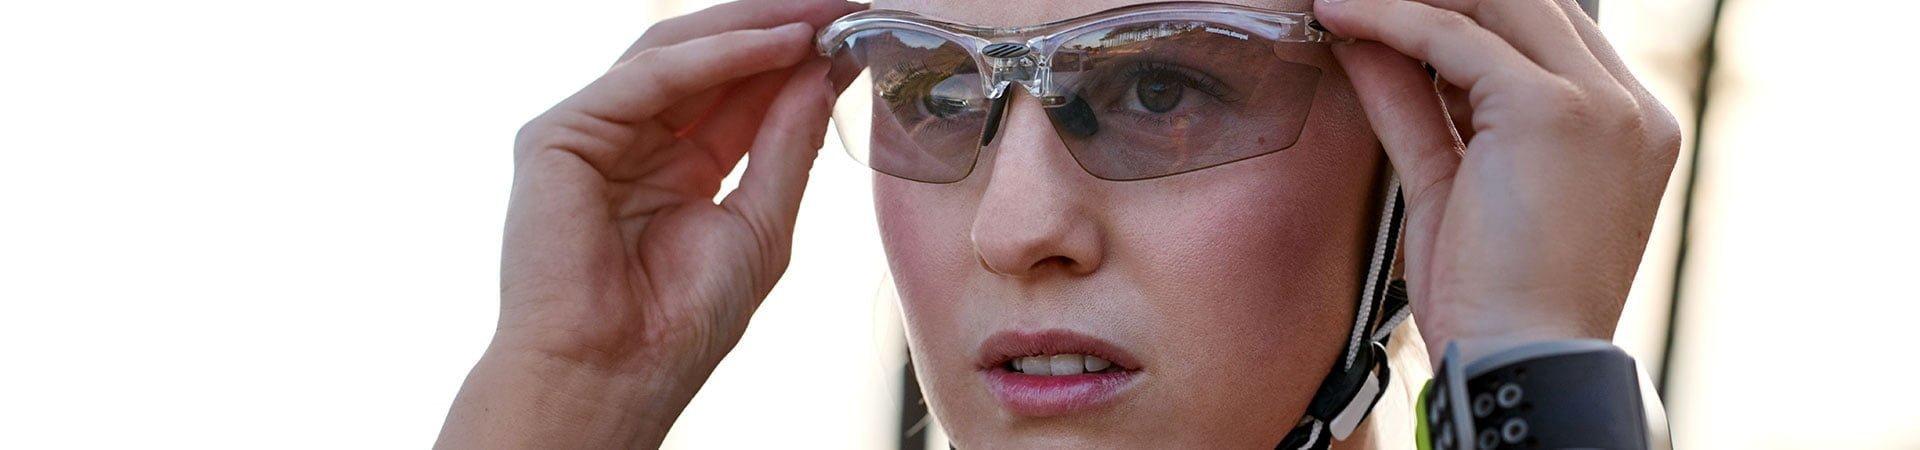 slider sports - Sports eyewear